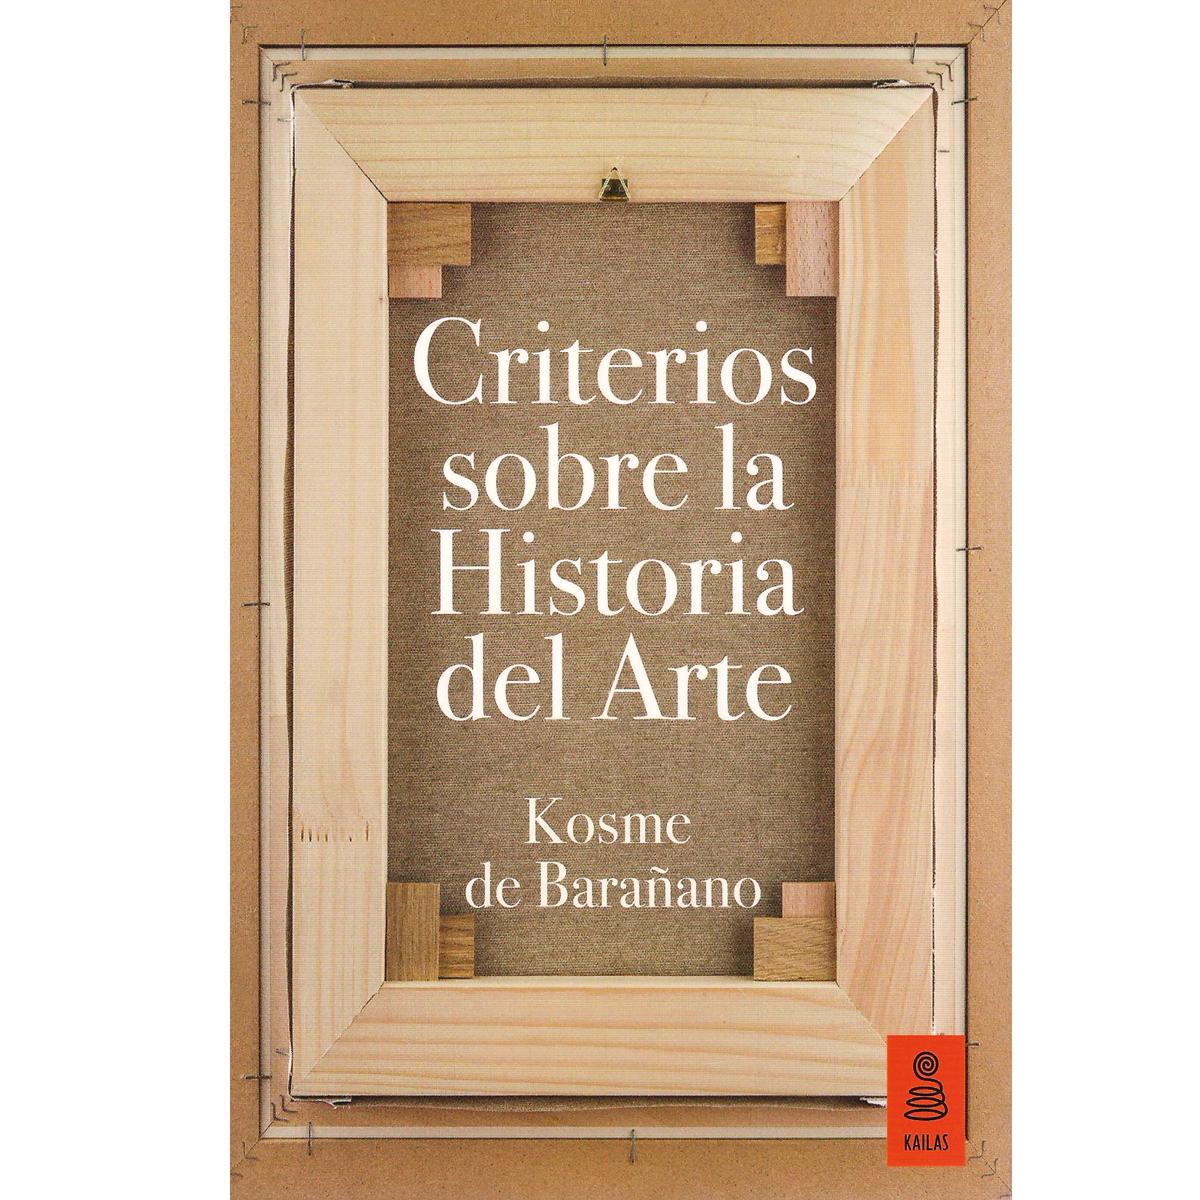 Criterios sobre la Historia del Arte